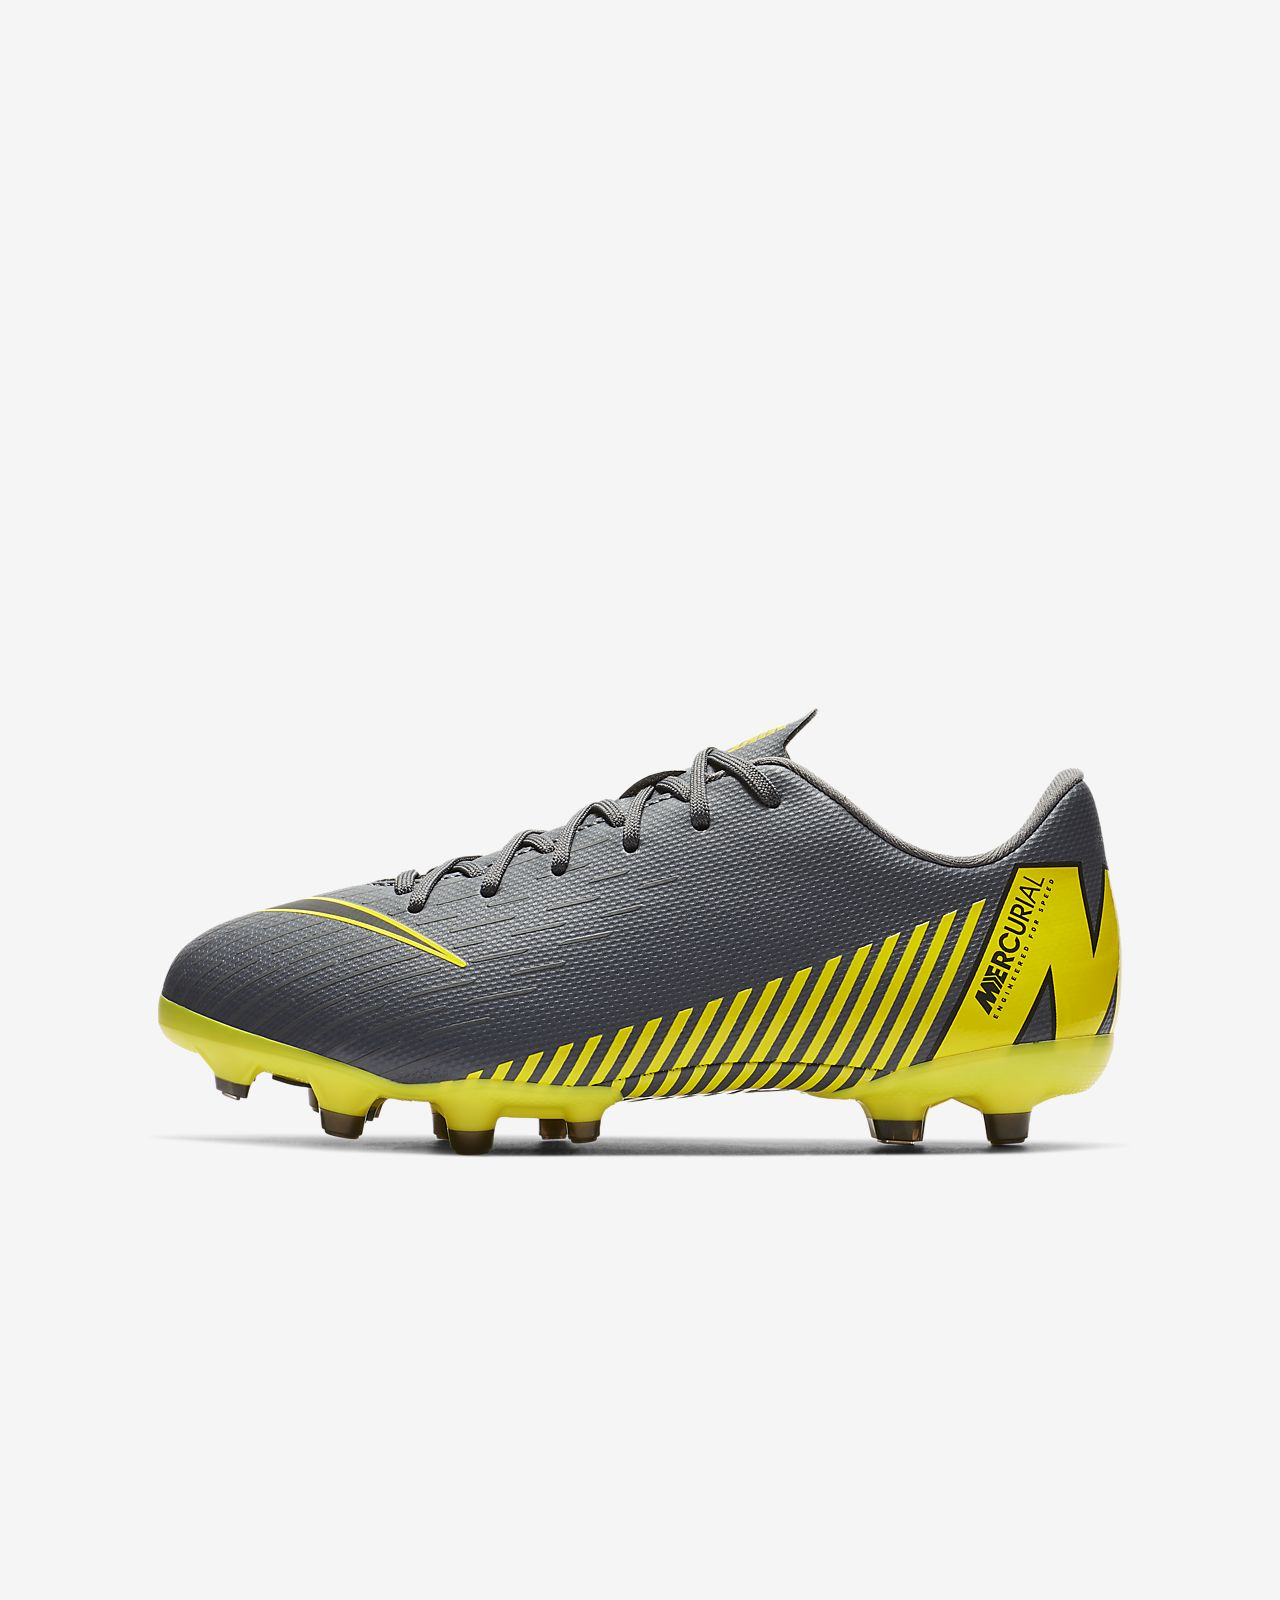 Terrains Chaussure Jr Mercurial Football Crampons À Multi De Nike Zxzqw7